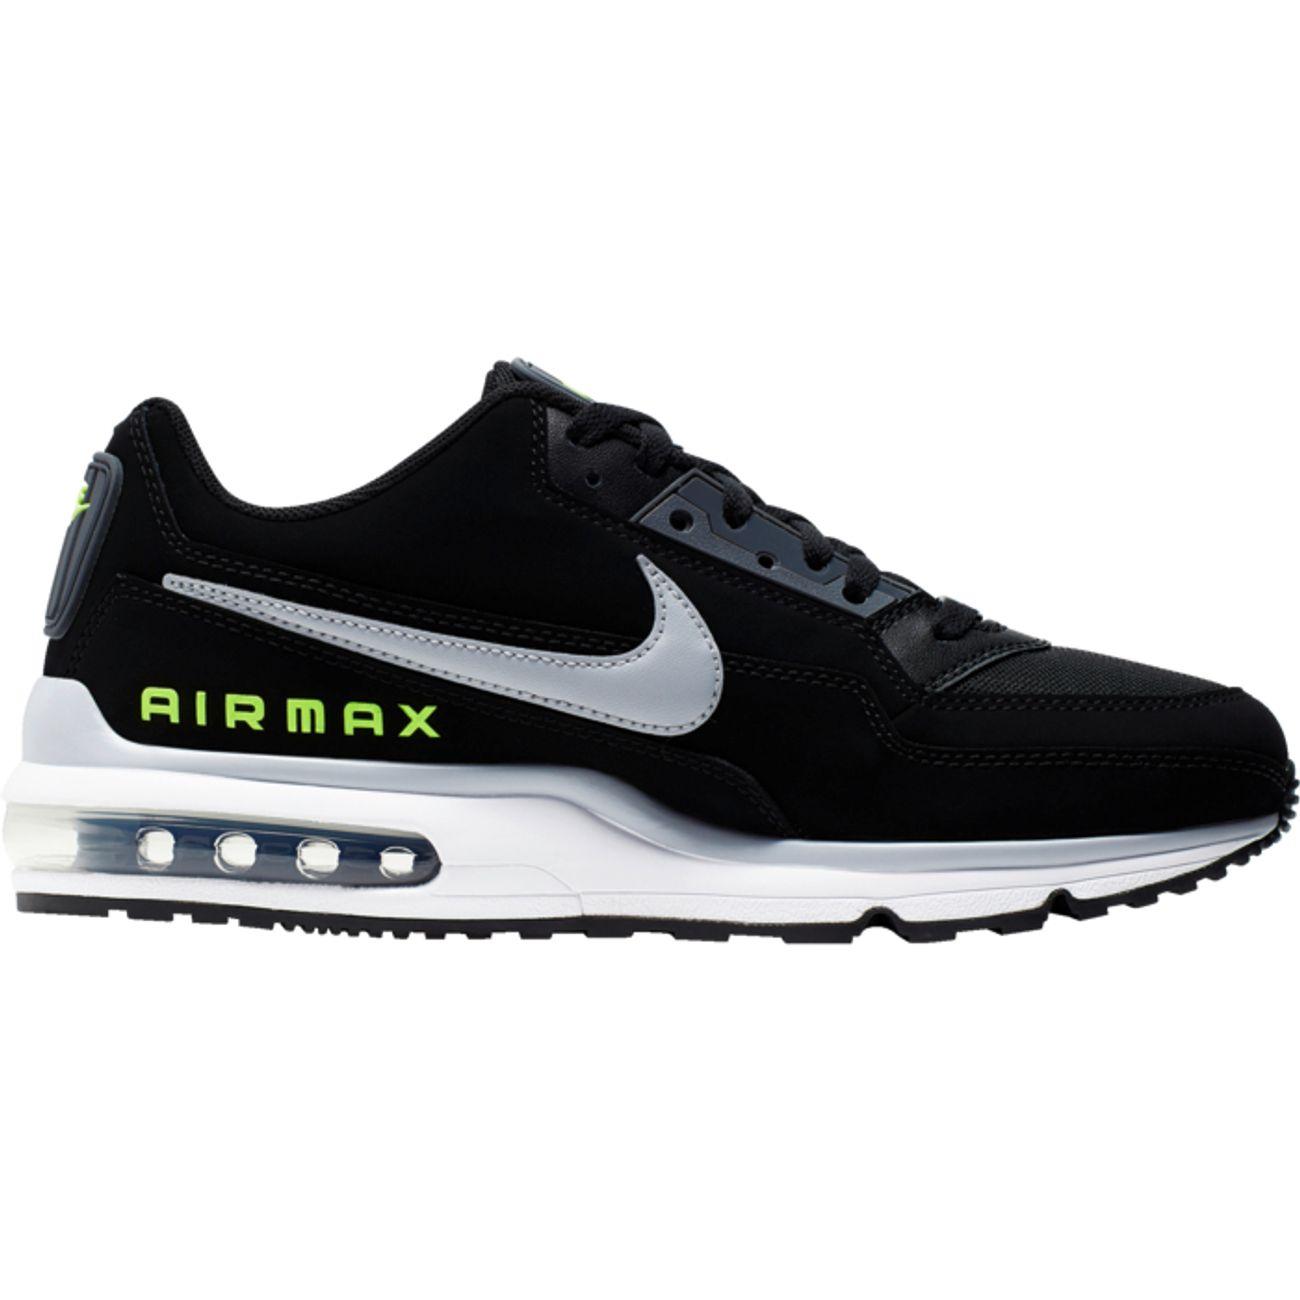 Max Homme 3 Chaussures Basses Air Nike Ltd PXiOZuk